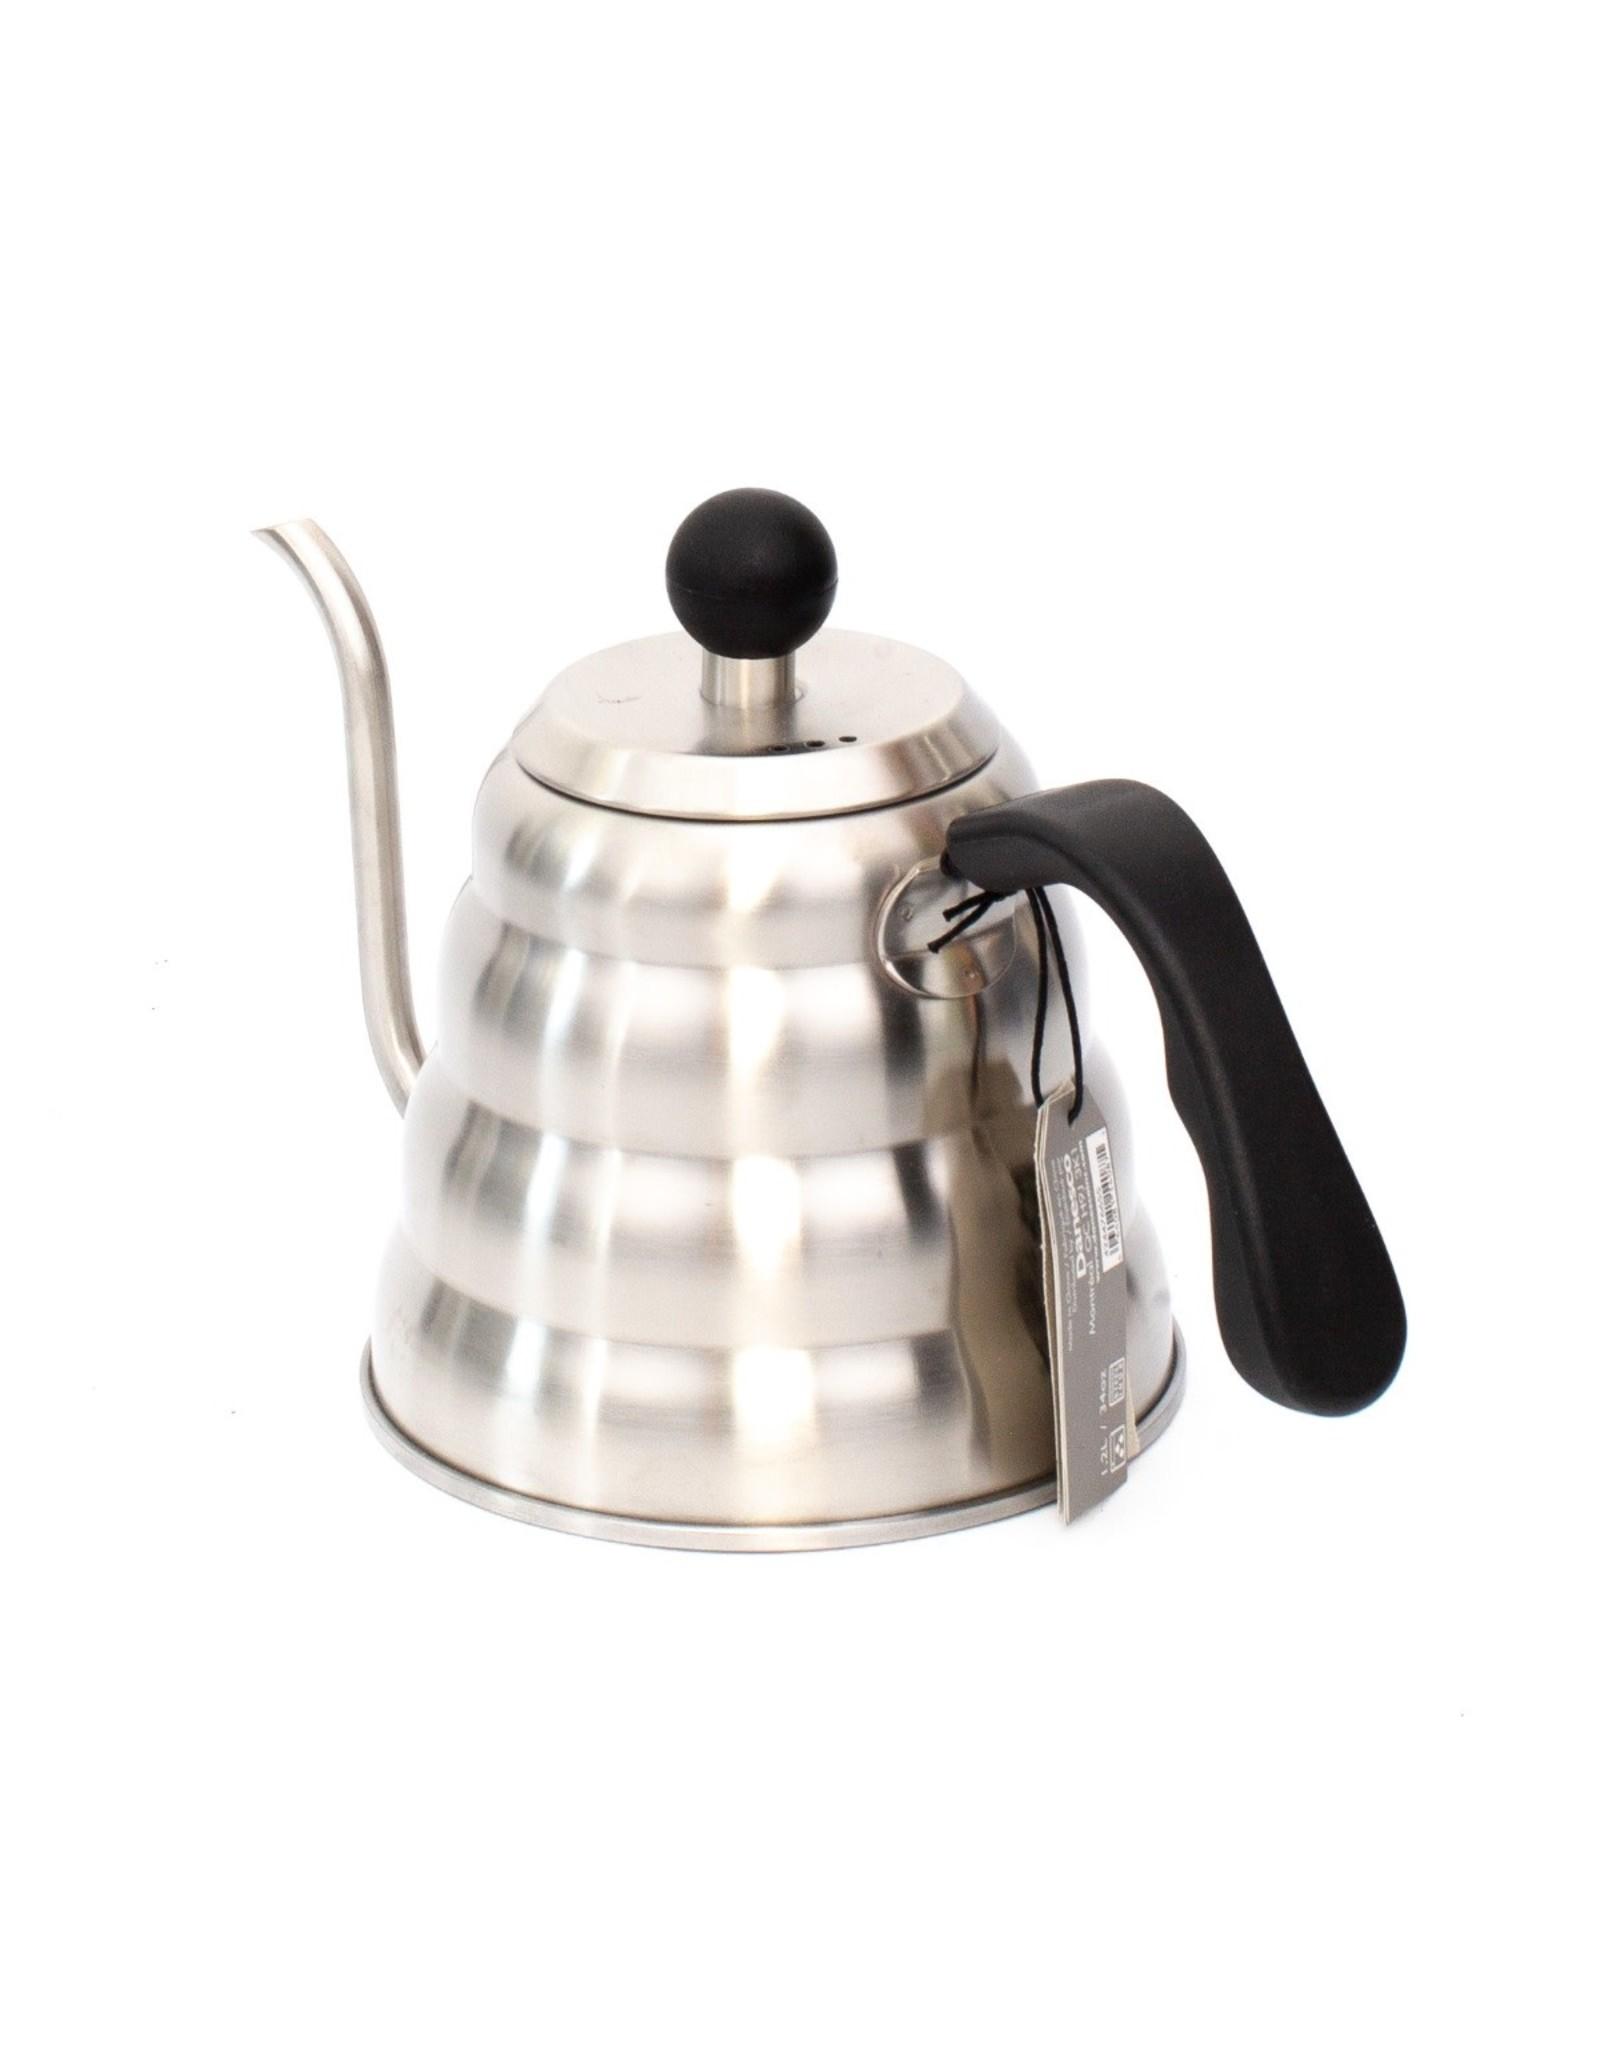 Café Culture Cafe Culture - Pour Over Kettle - Stainless Steel